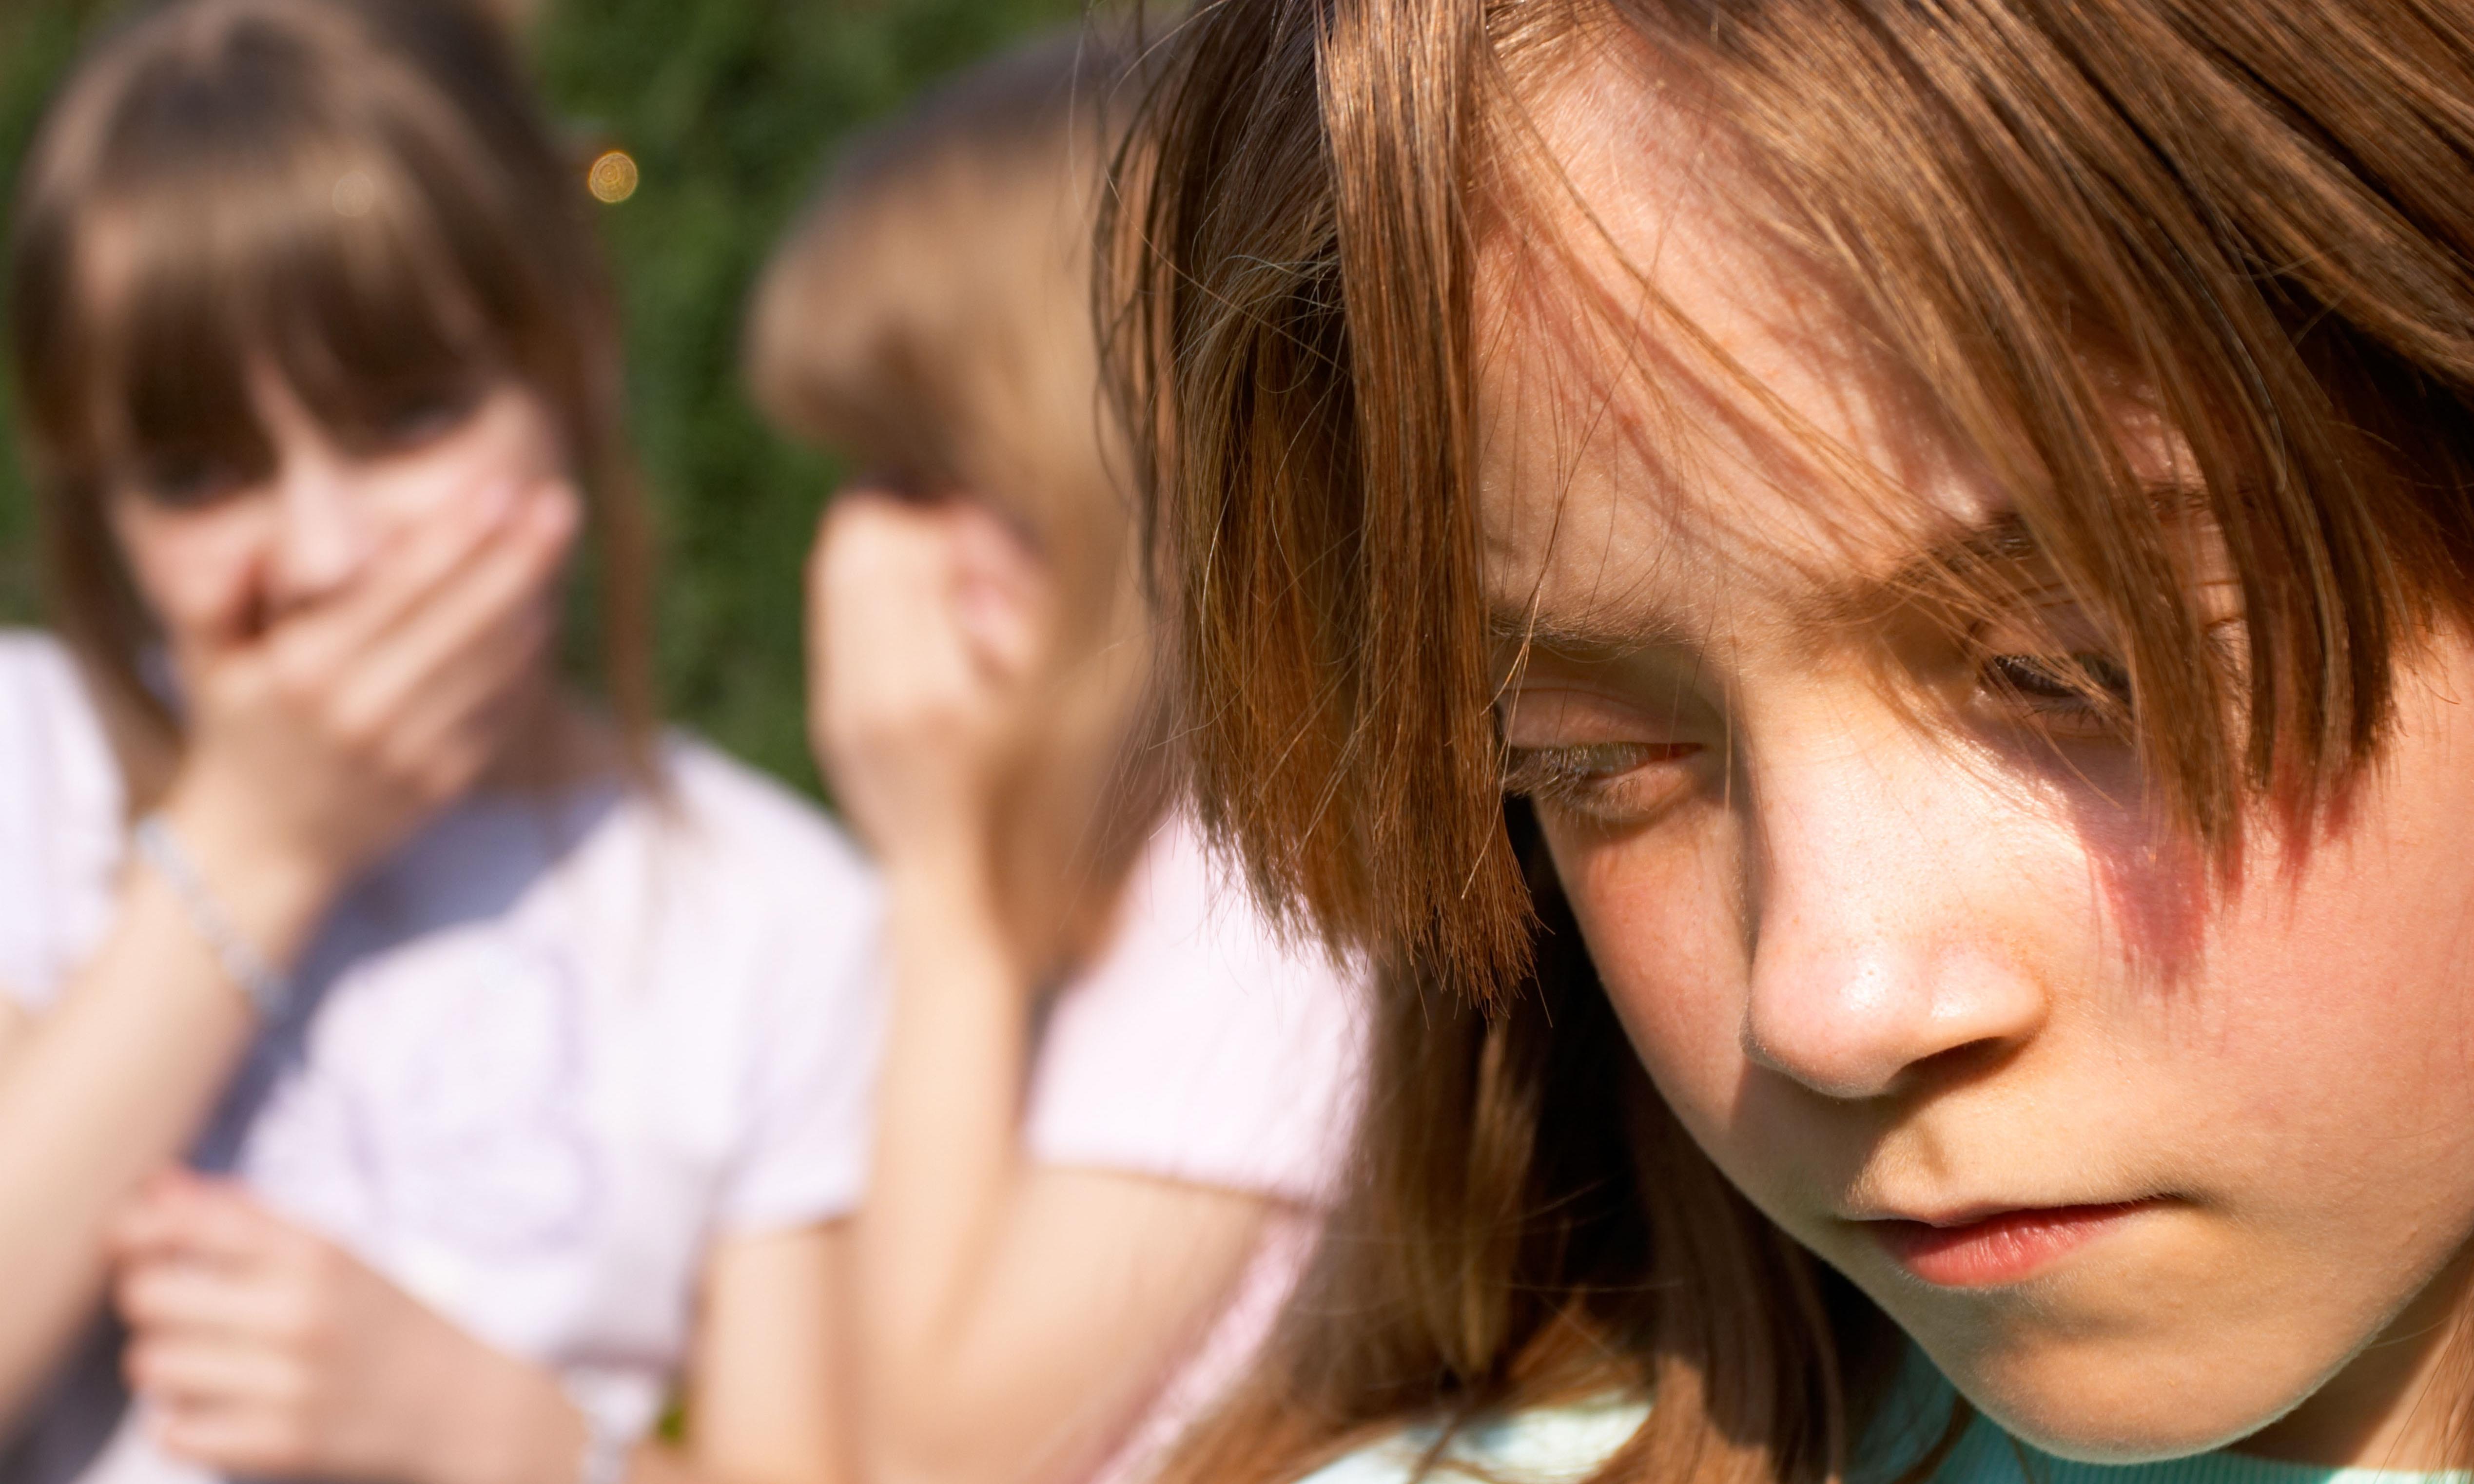 A girl put my daughter through hell, but her mother won't listen